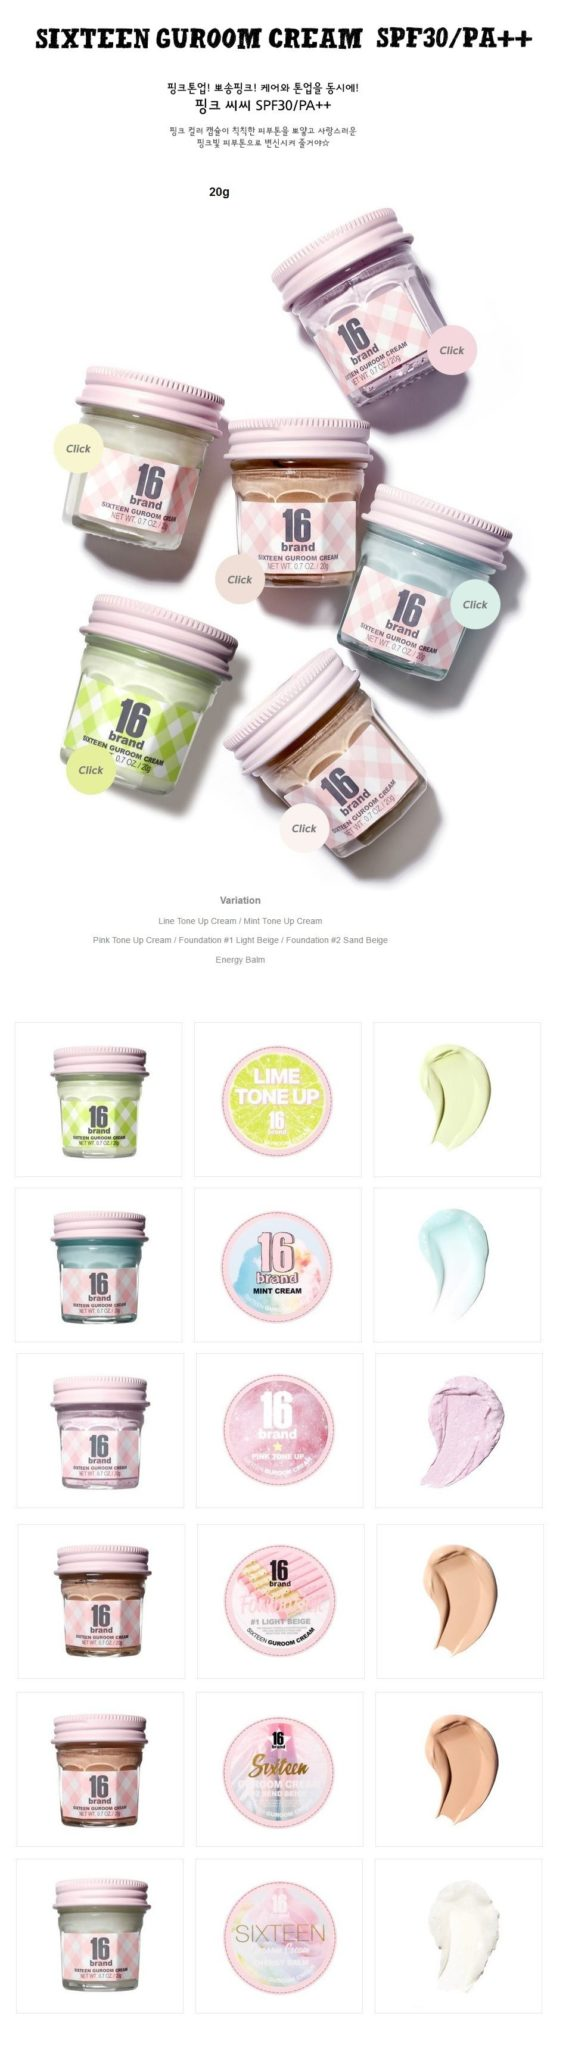 16 brand Sixteen Guroom Cream korean cosmetic skincare product online shop malaysia singapore india1